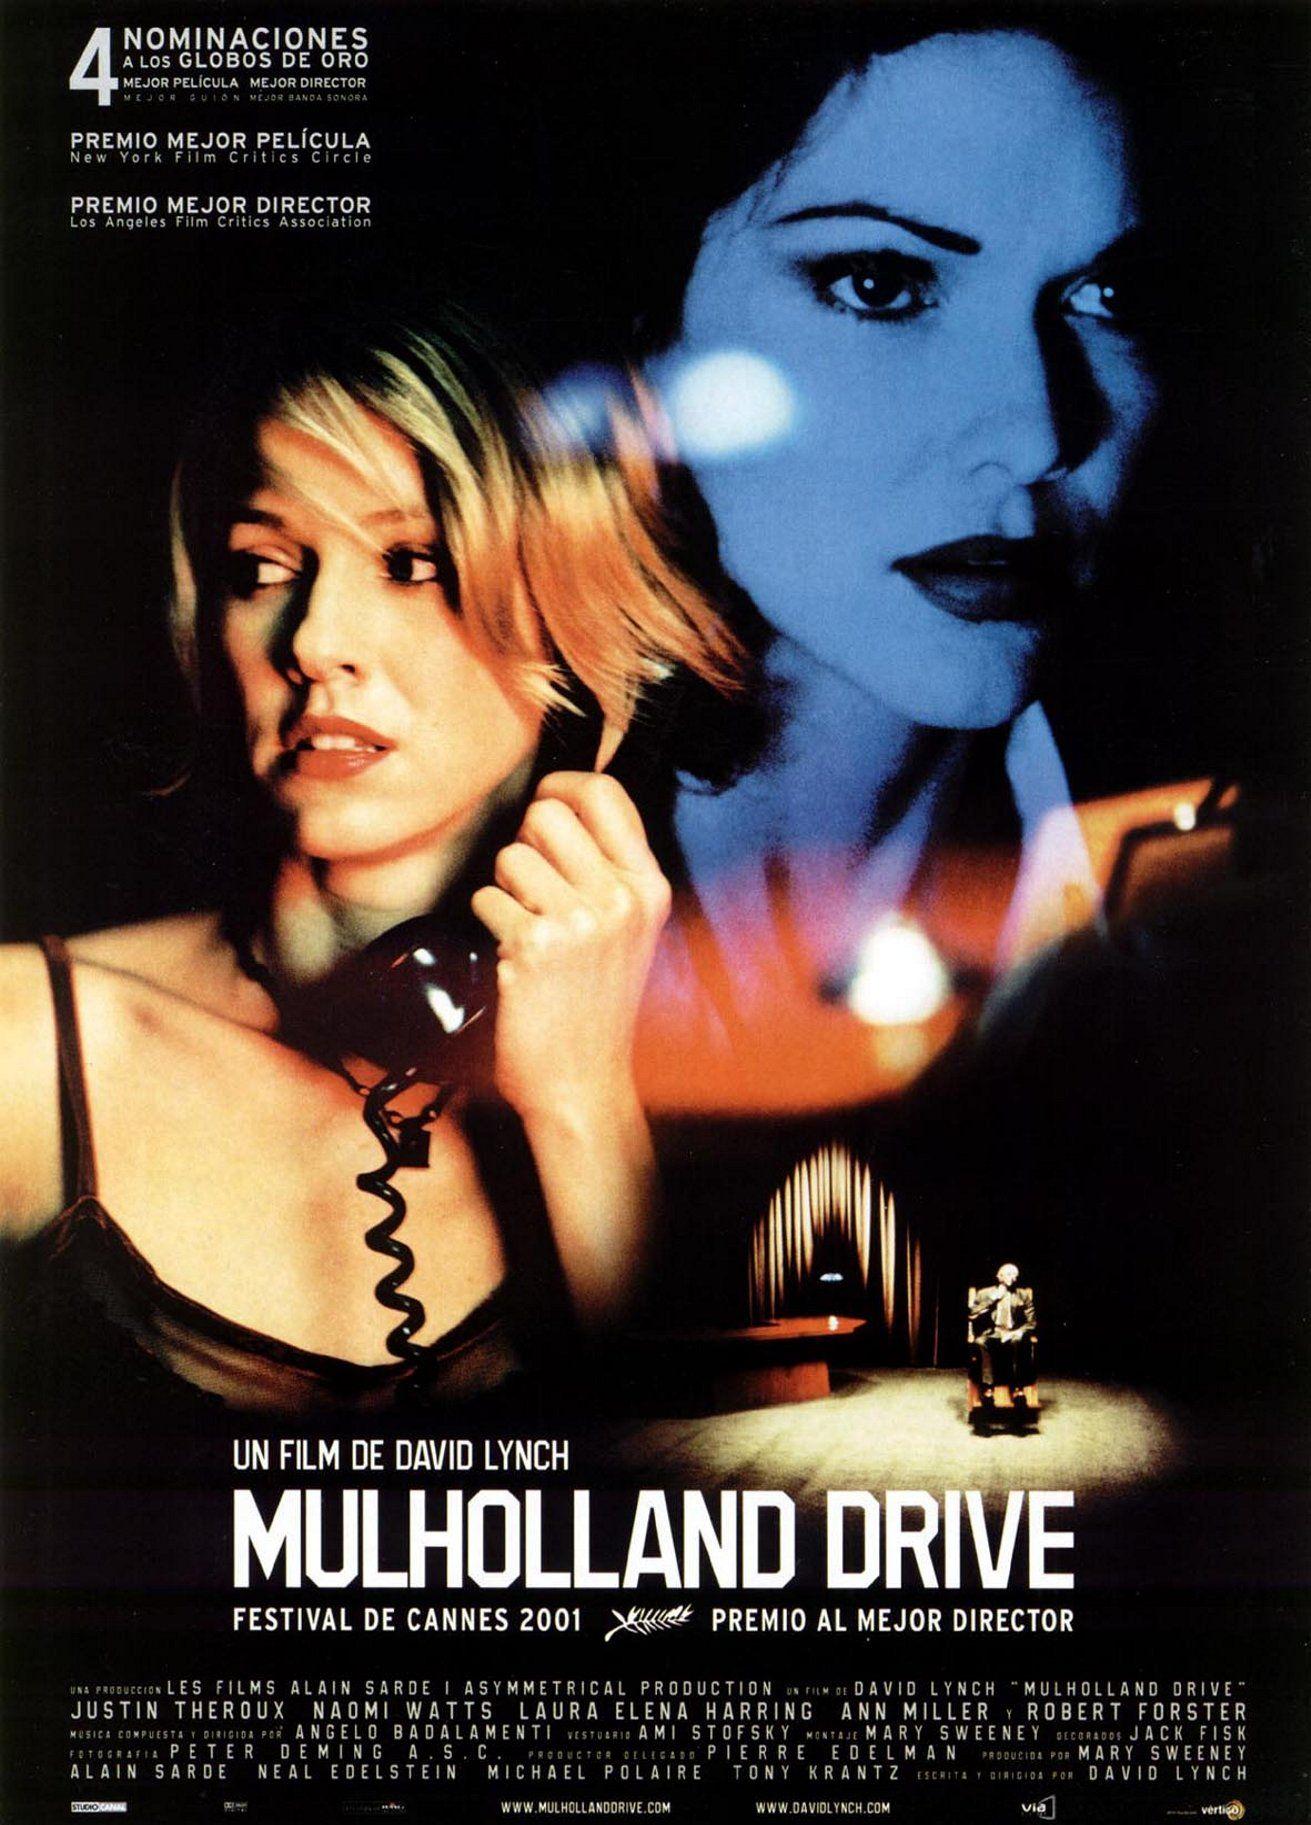 Mulholland Drive Aka Mulholland Dr 2001 Director David Lynch